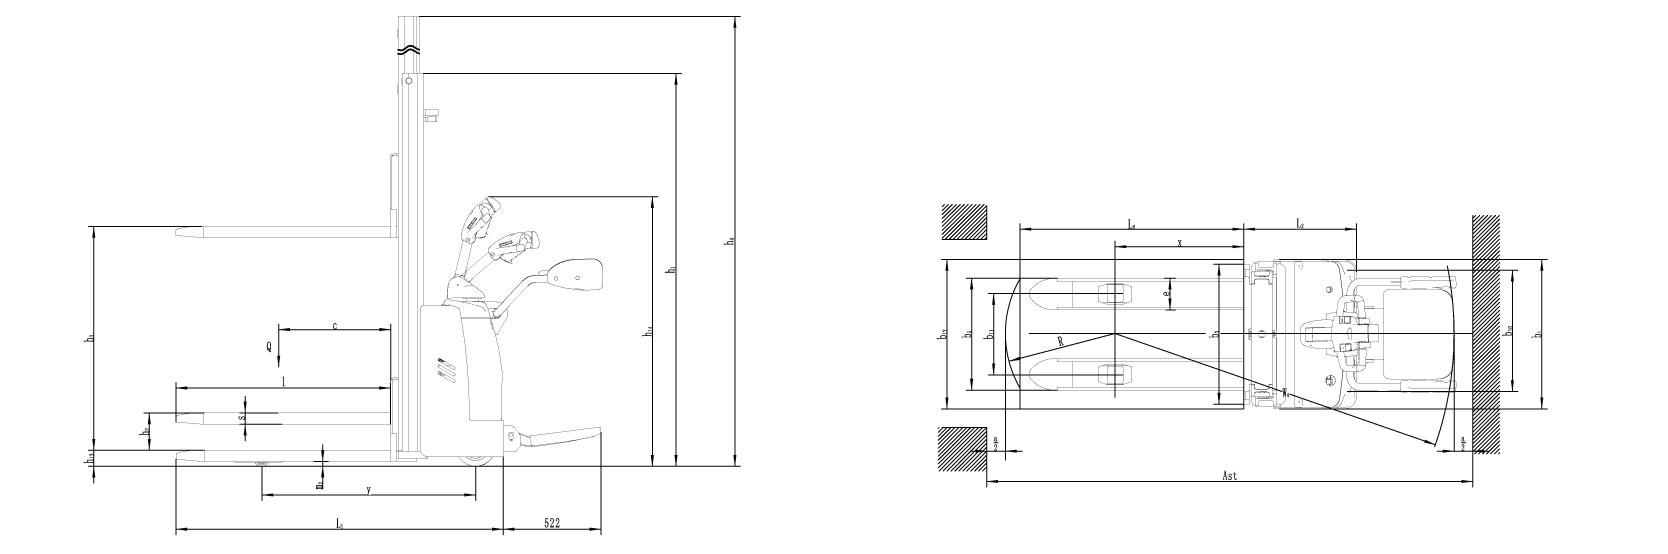 FORTIS-1.4---L1-draw.jpg (59 KB)